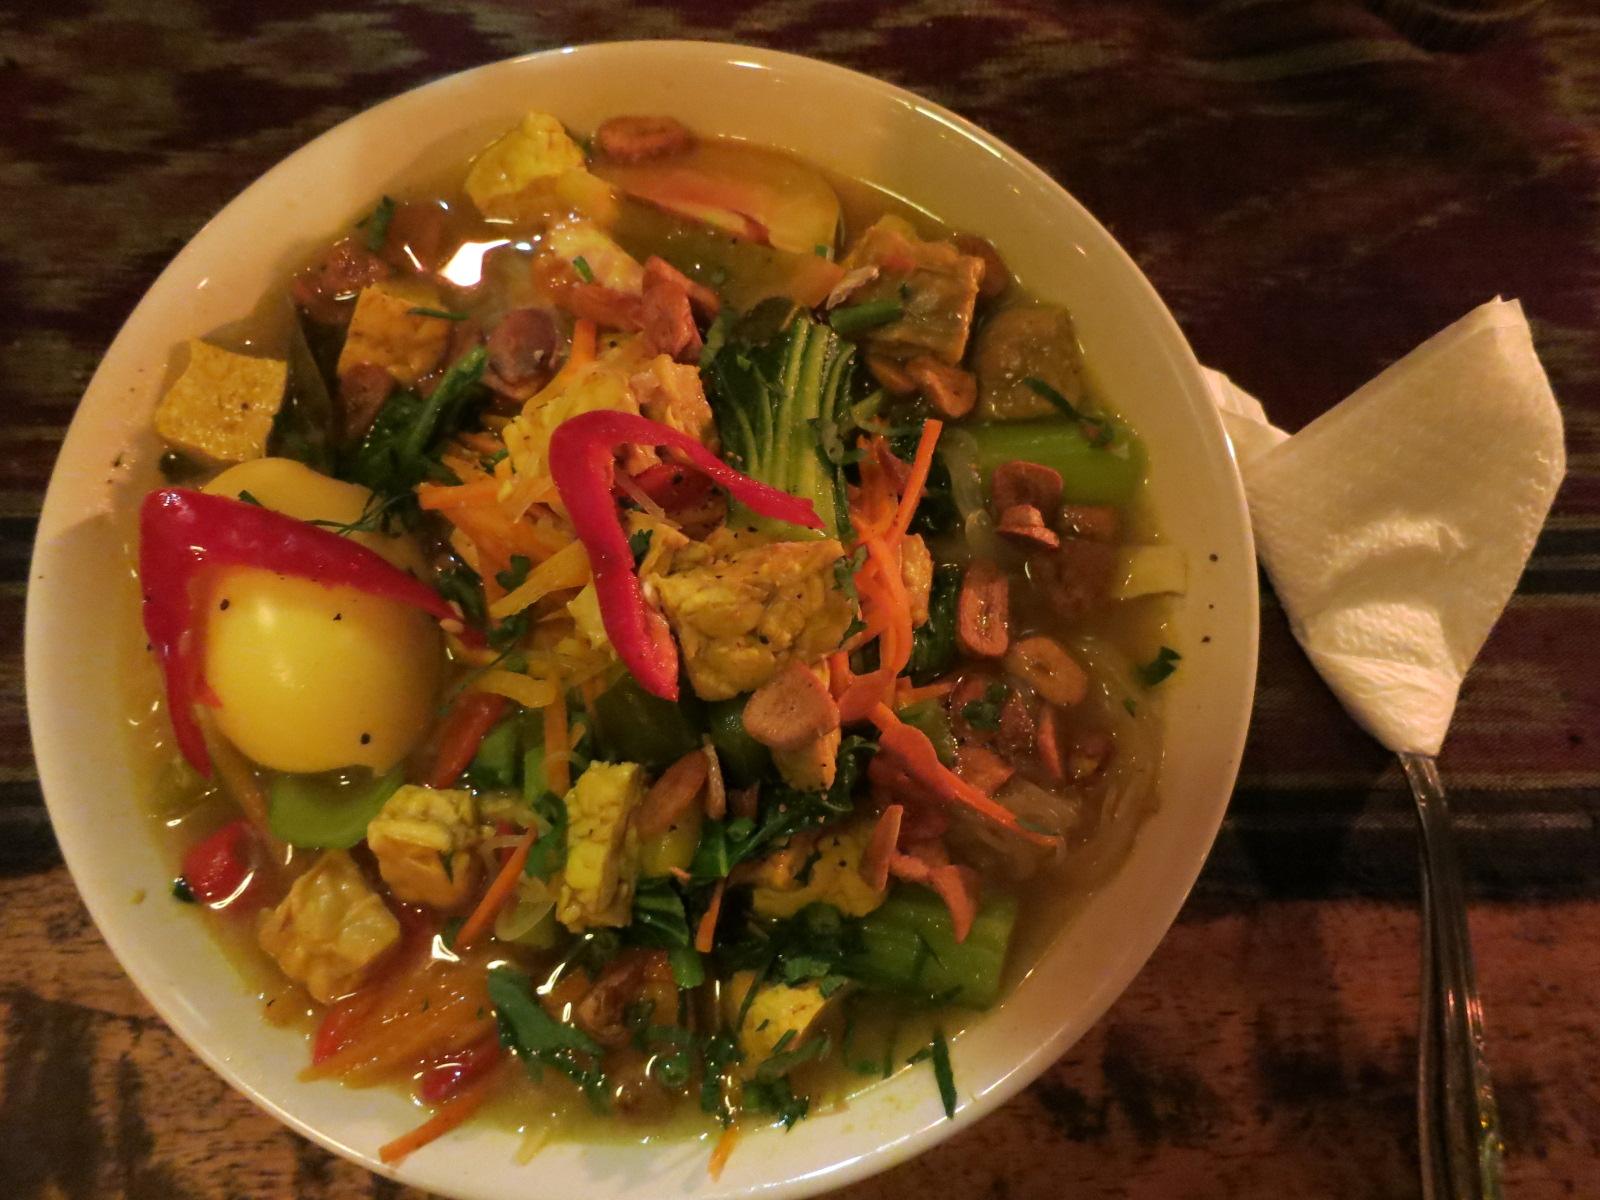 My favorite soup from Bintang Bali